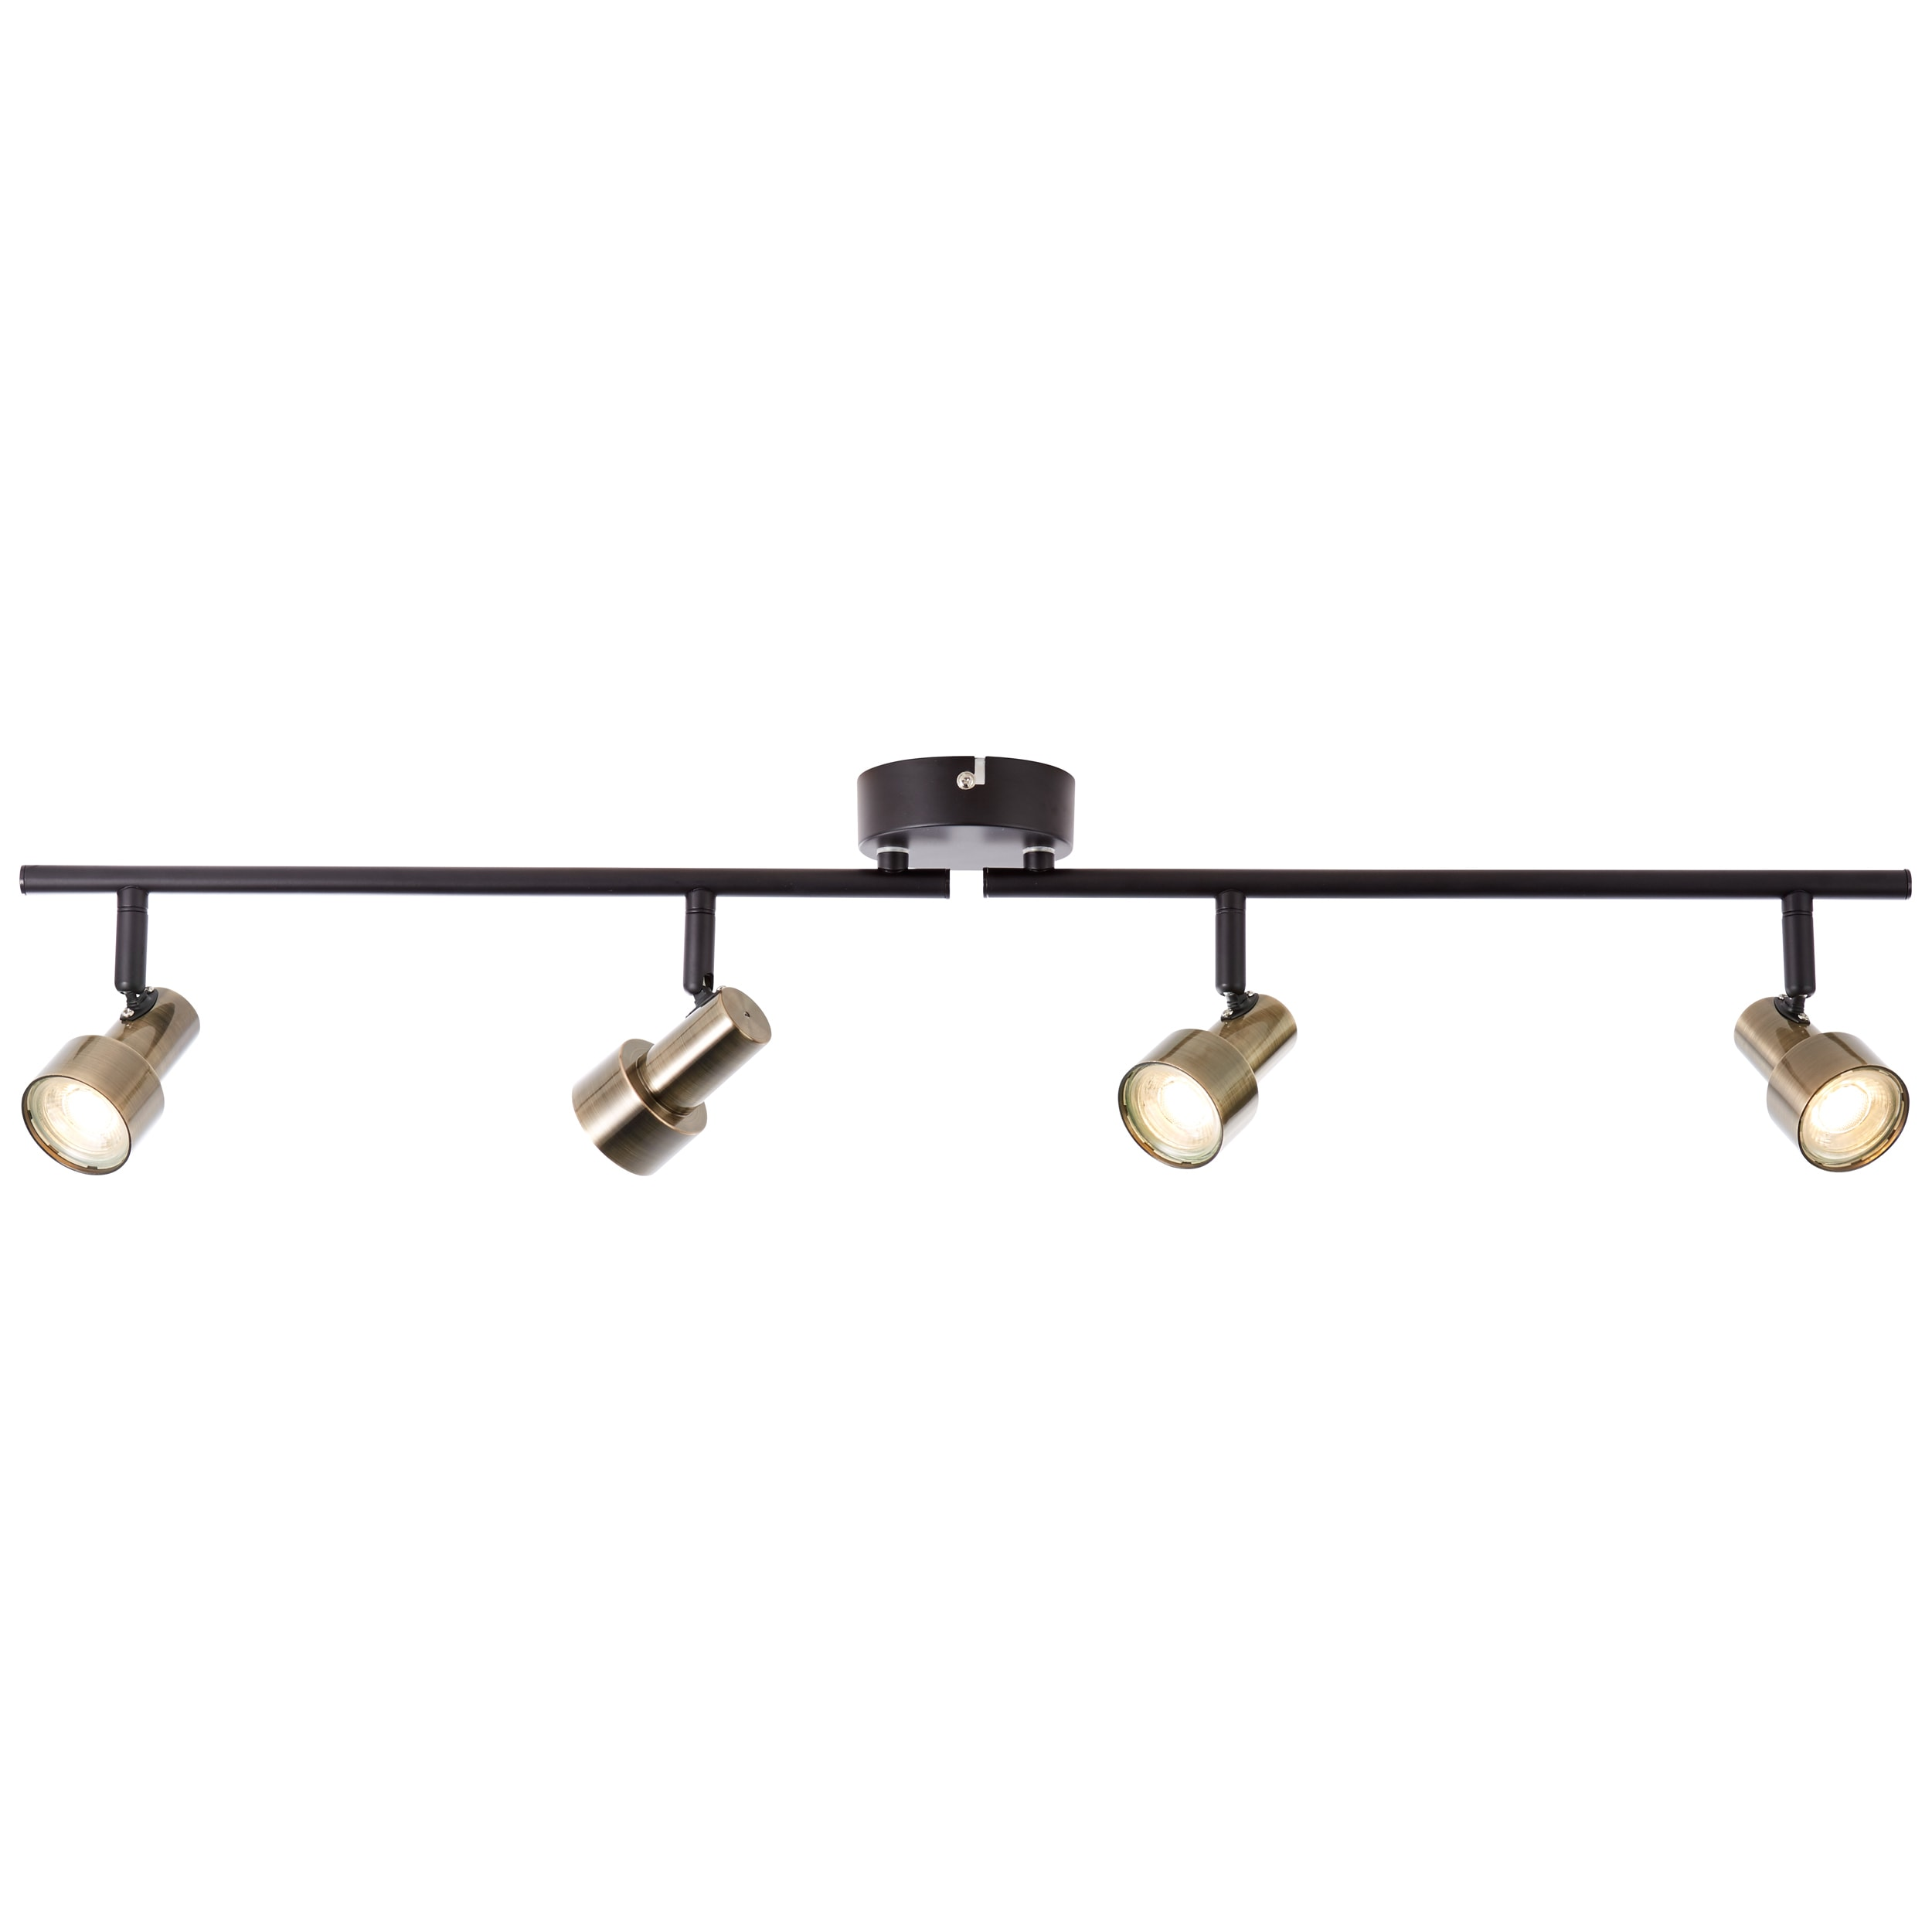 Brilliant Leuchten Croyden LED Spotrohr 4flg messing/schwarz